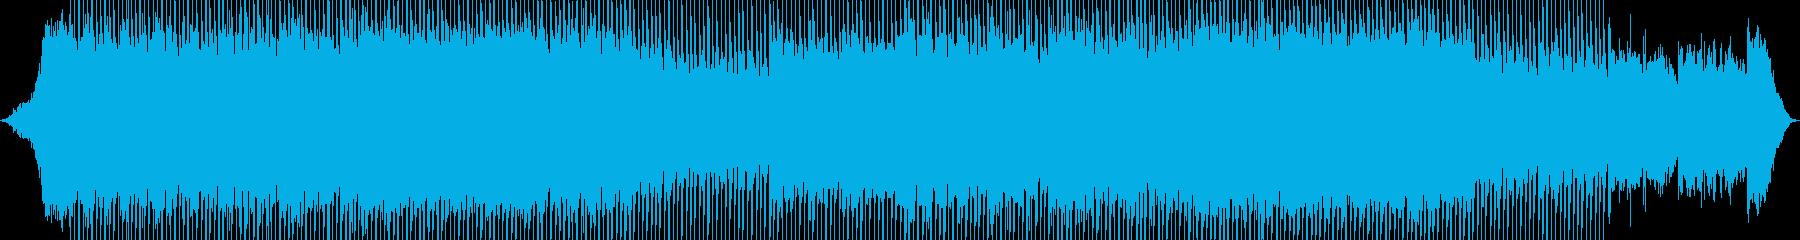 EDMポップで明るいクラブ系-46の再生済みの波形